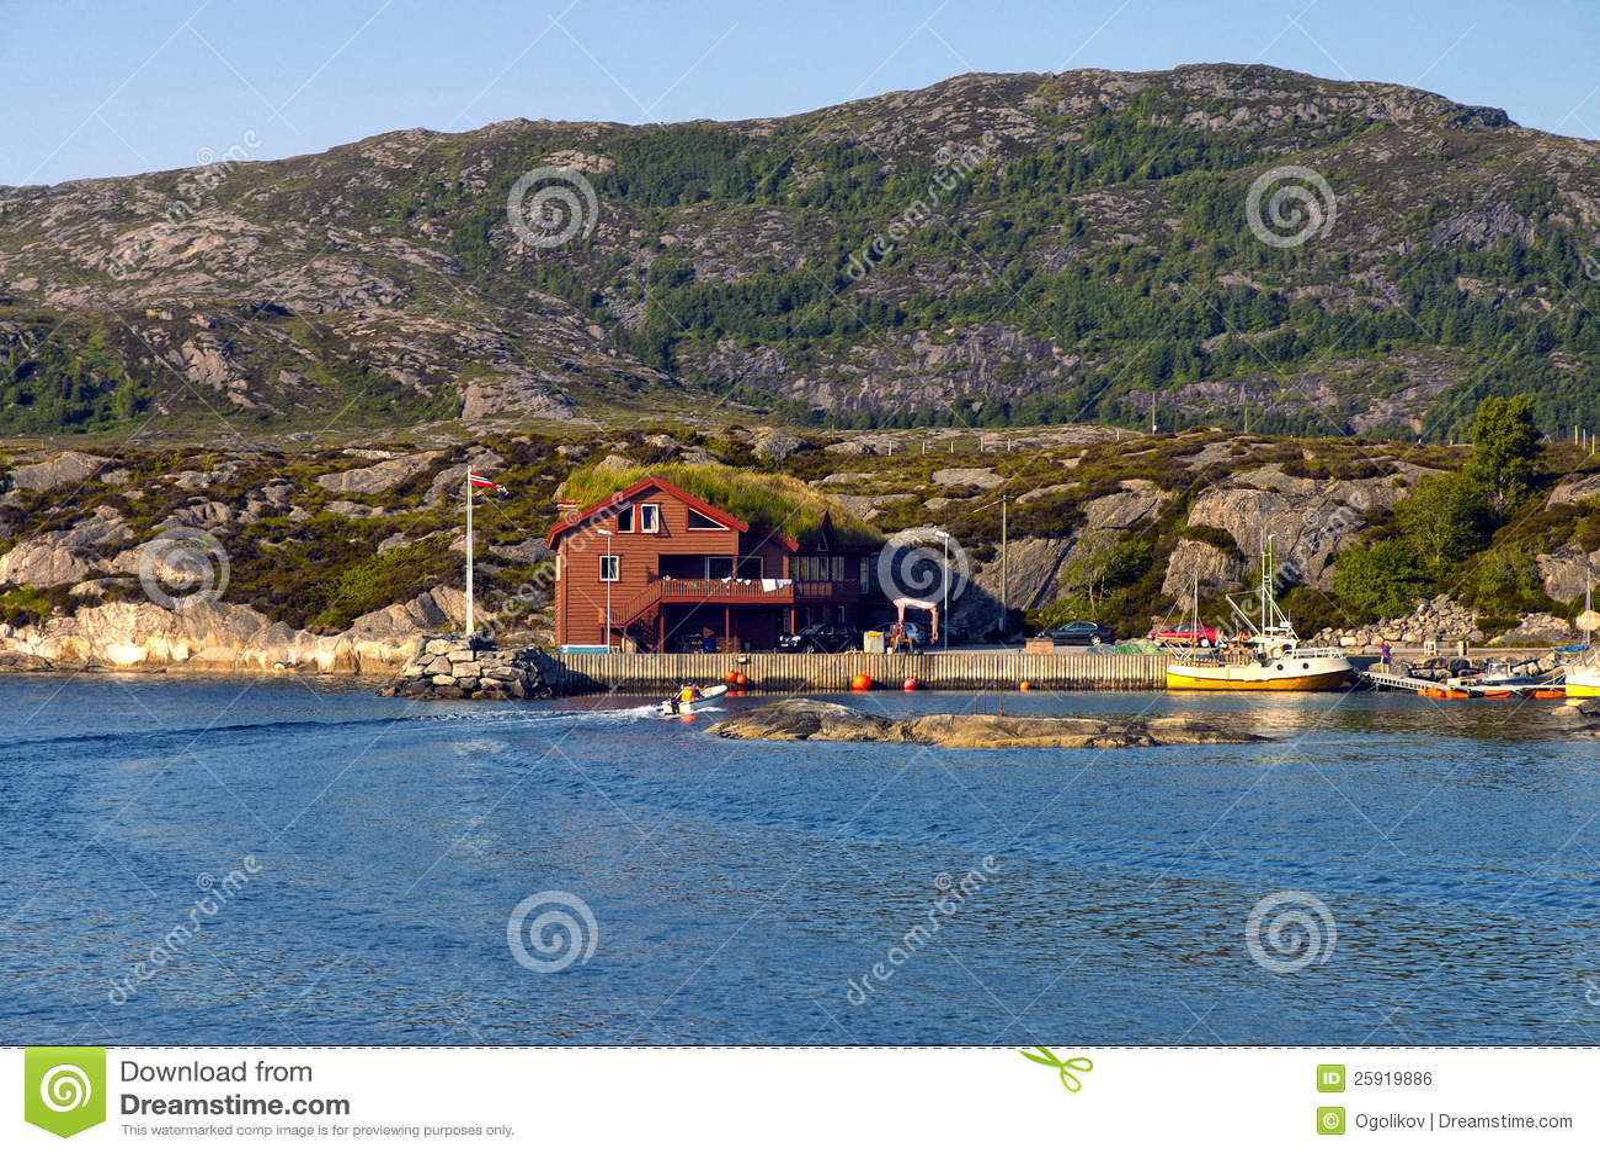 Haus in norwegen auf dem ufer des fjords lizenzfreies for Norwegen haus